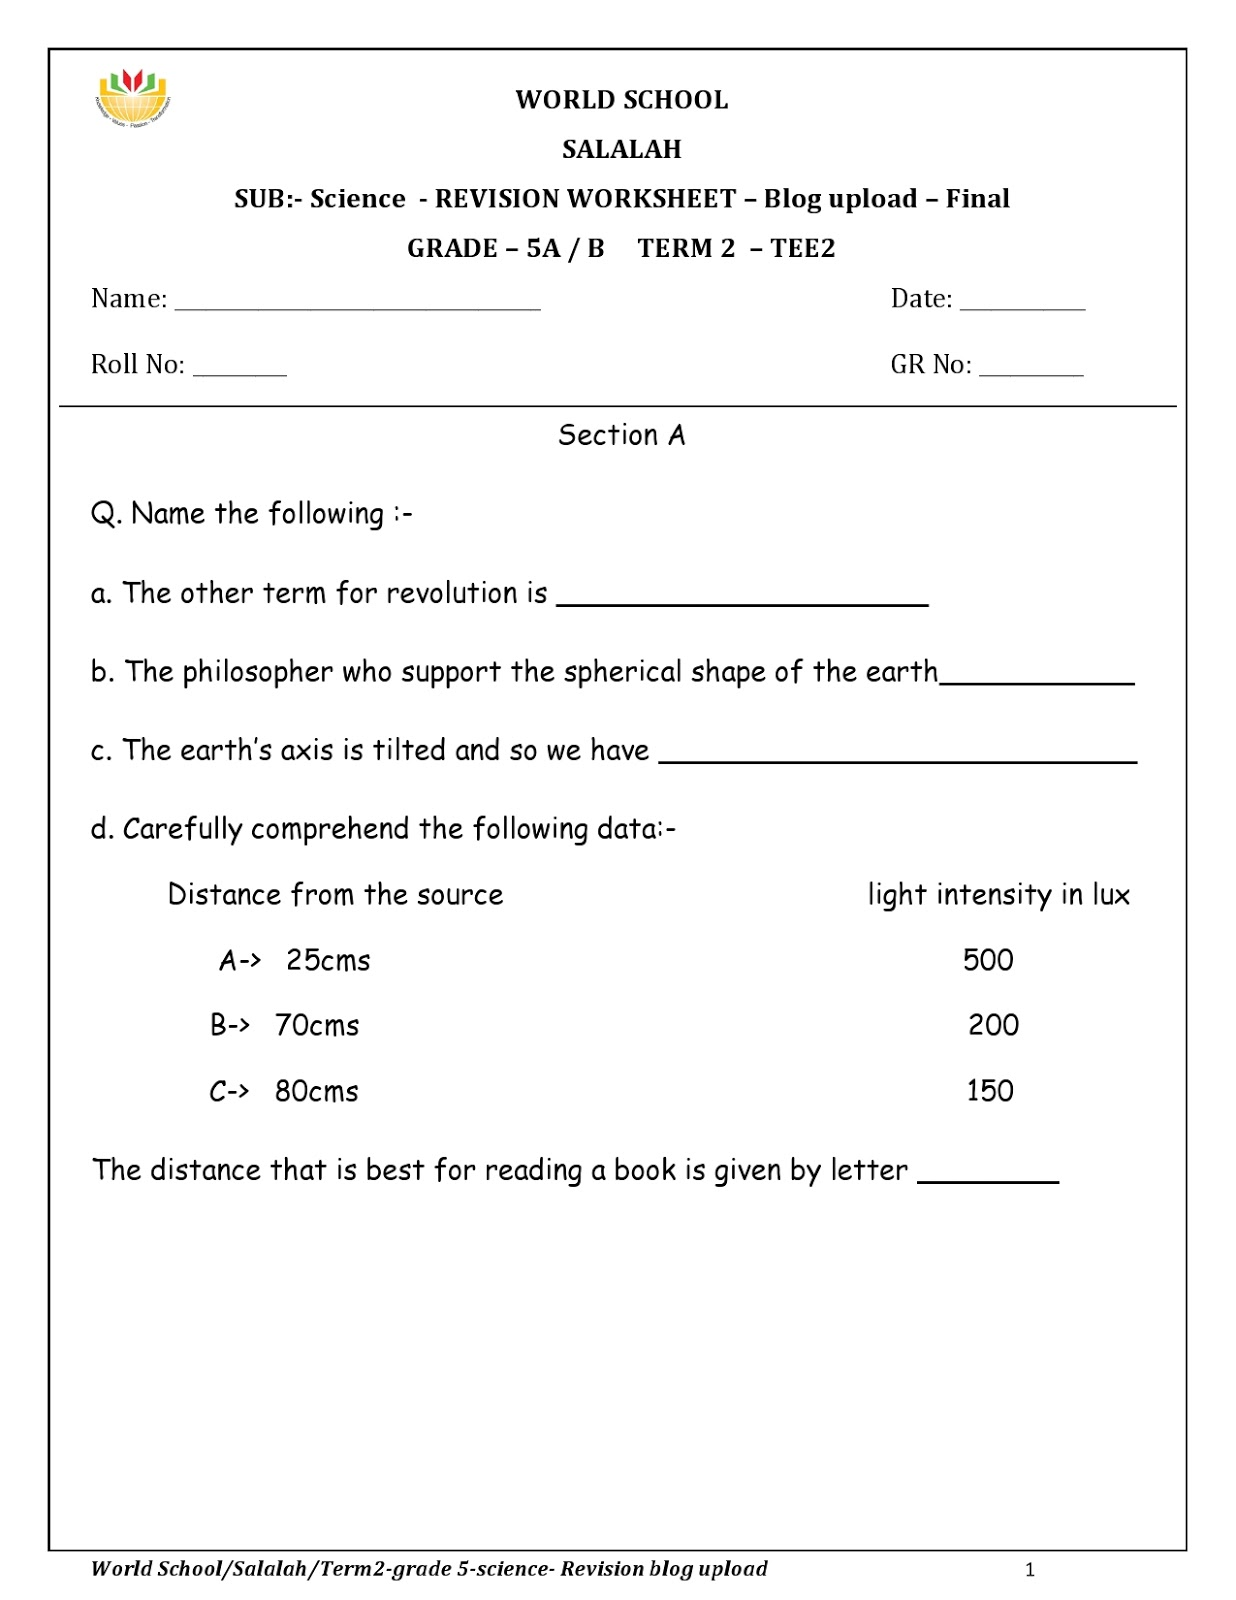 medium resolution of Revision Worksheets for Grade 5 as on 13-05-2019   WORLD SCHOOL OMAN